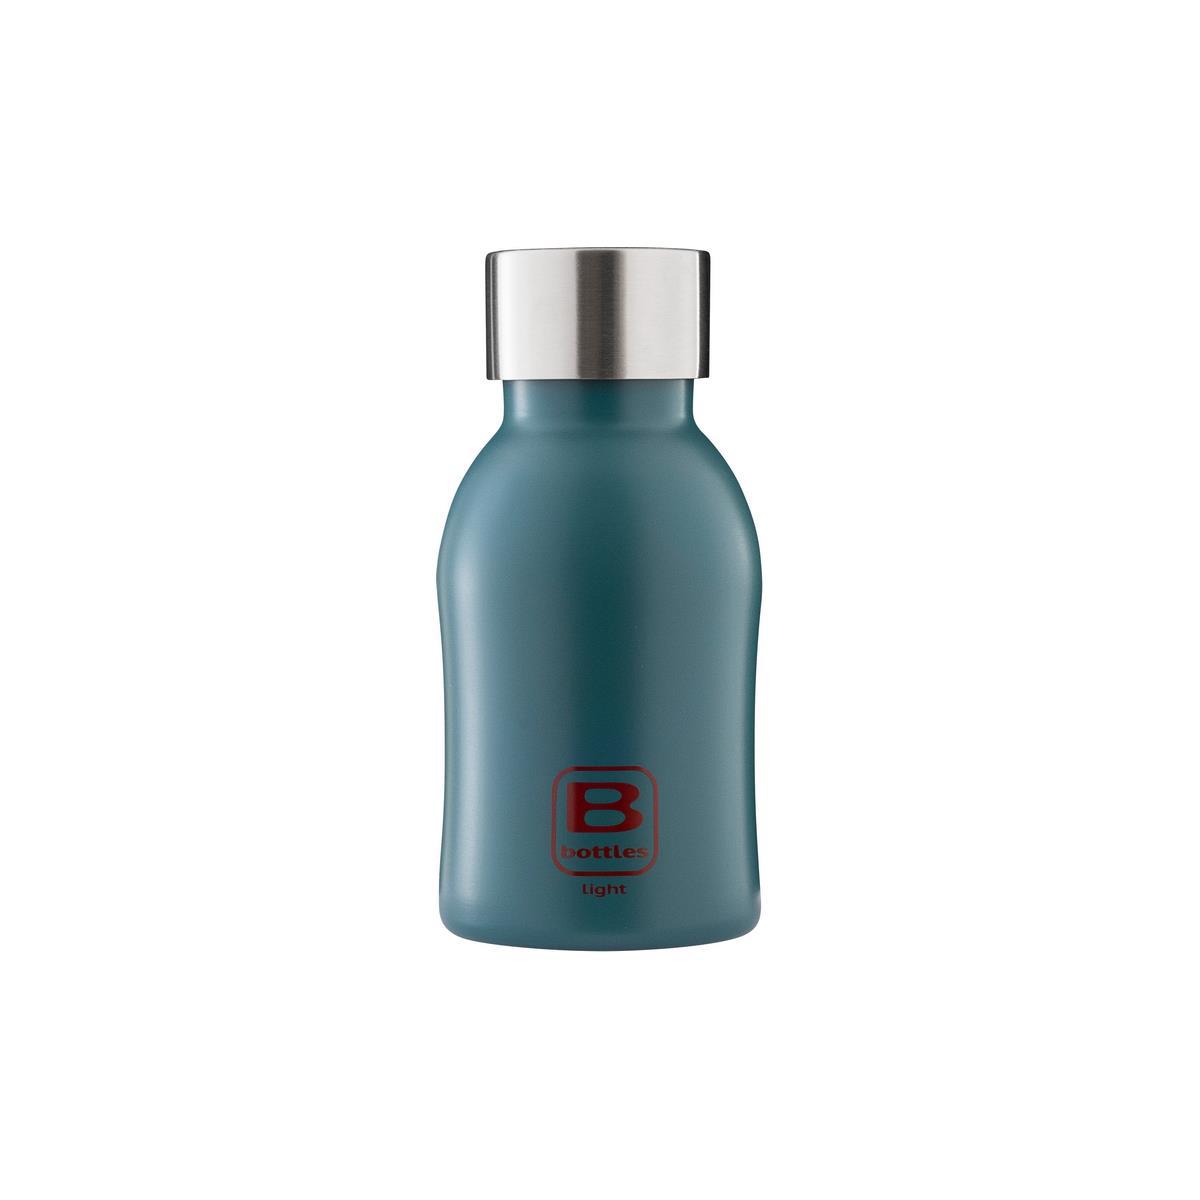 B Bottles Light - Teal Blue - 350 ml - Bottiglia in acciaio inox 18/10 ultra leggera e compatta